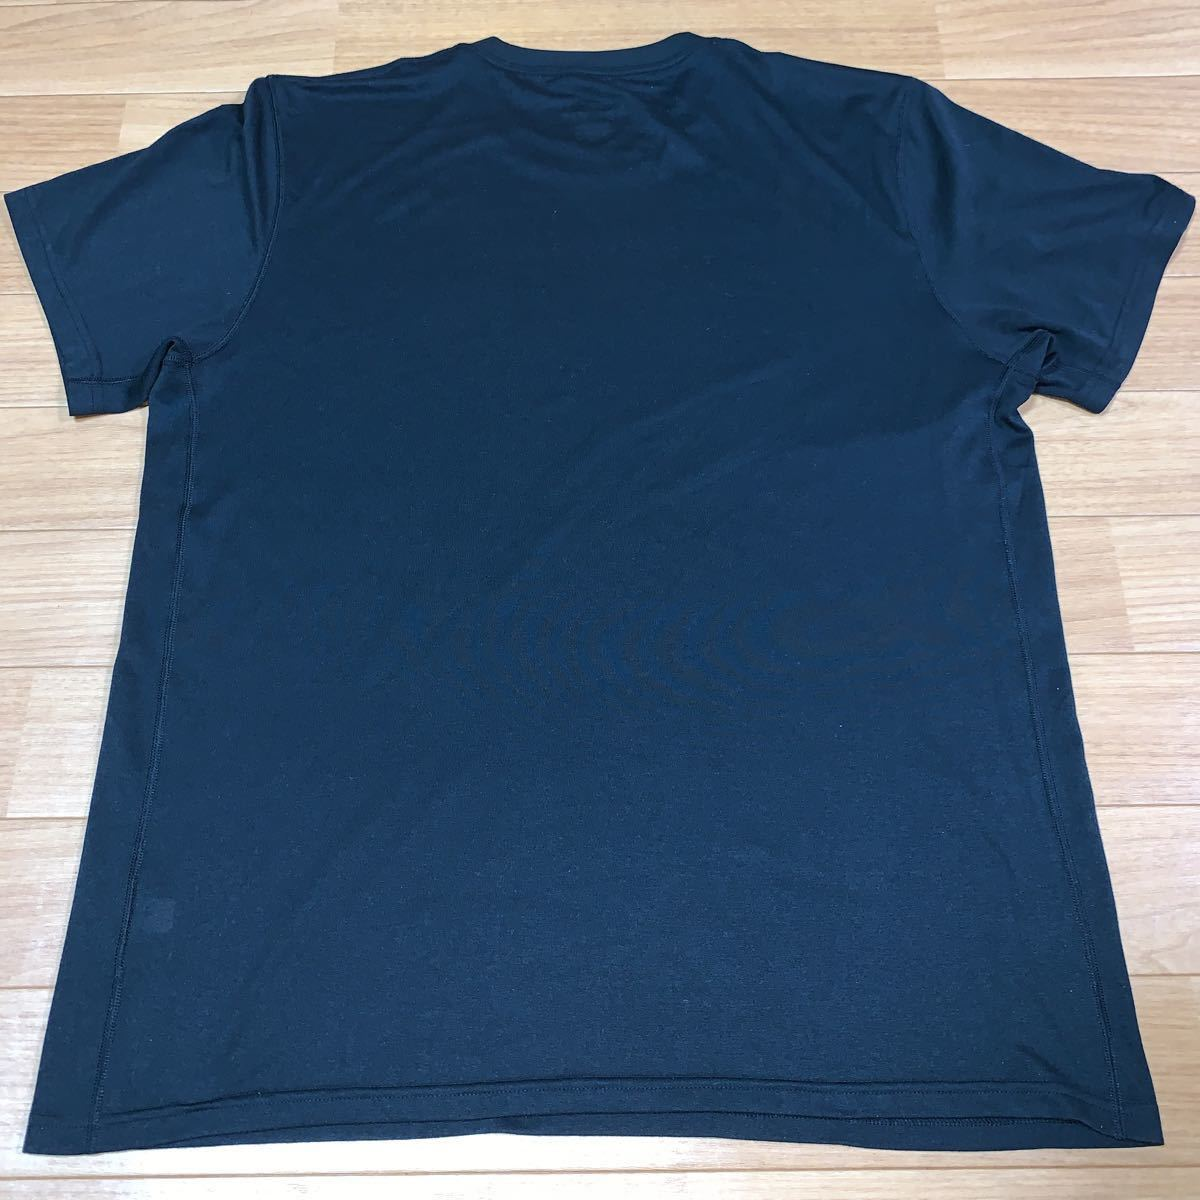 Nike DRY FIT ナイキ ドライフィット 半袖 XXL ブラック XL 2XL 速乾 ドライ Tシャツ NIKE 半袖Tシャツ 黒_画像6